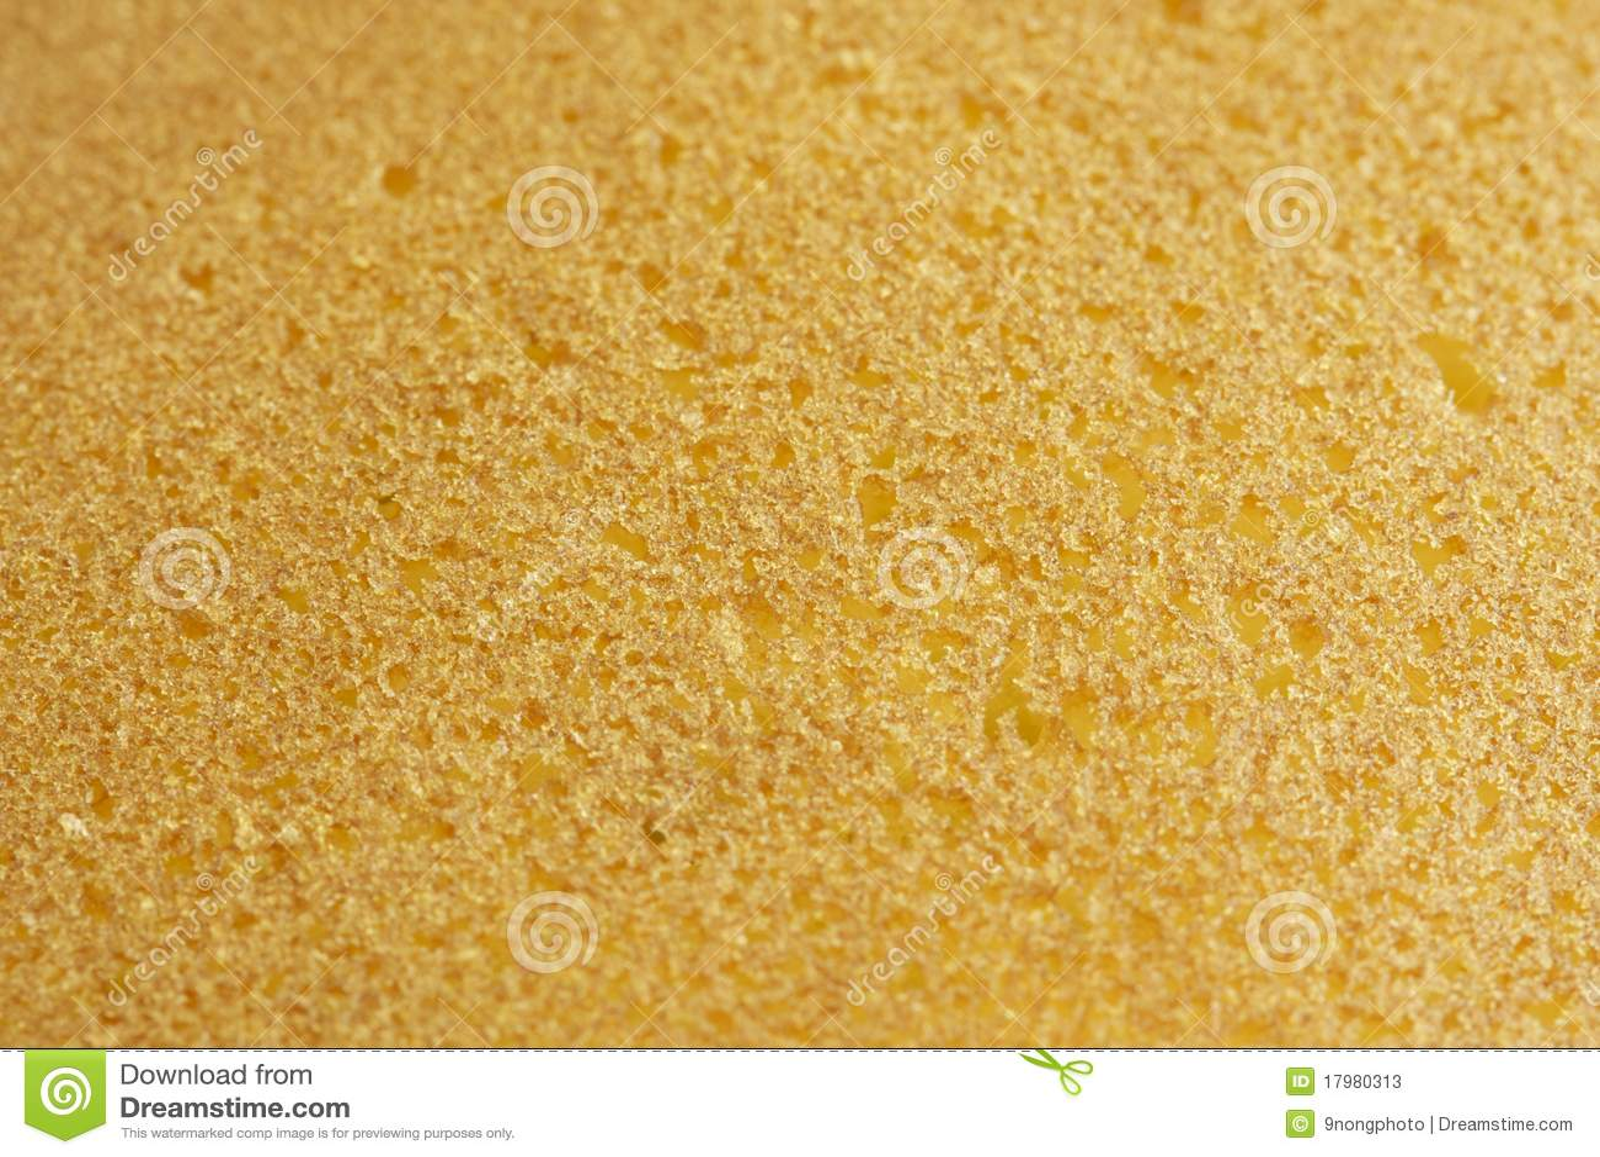 Sponge Cake Texture Stock Photos Image 17980313